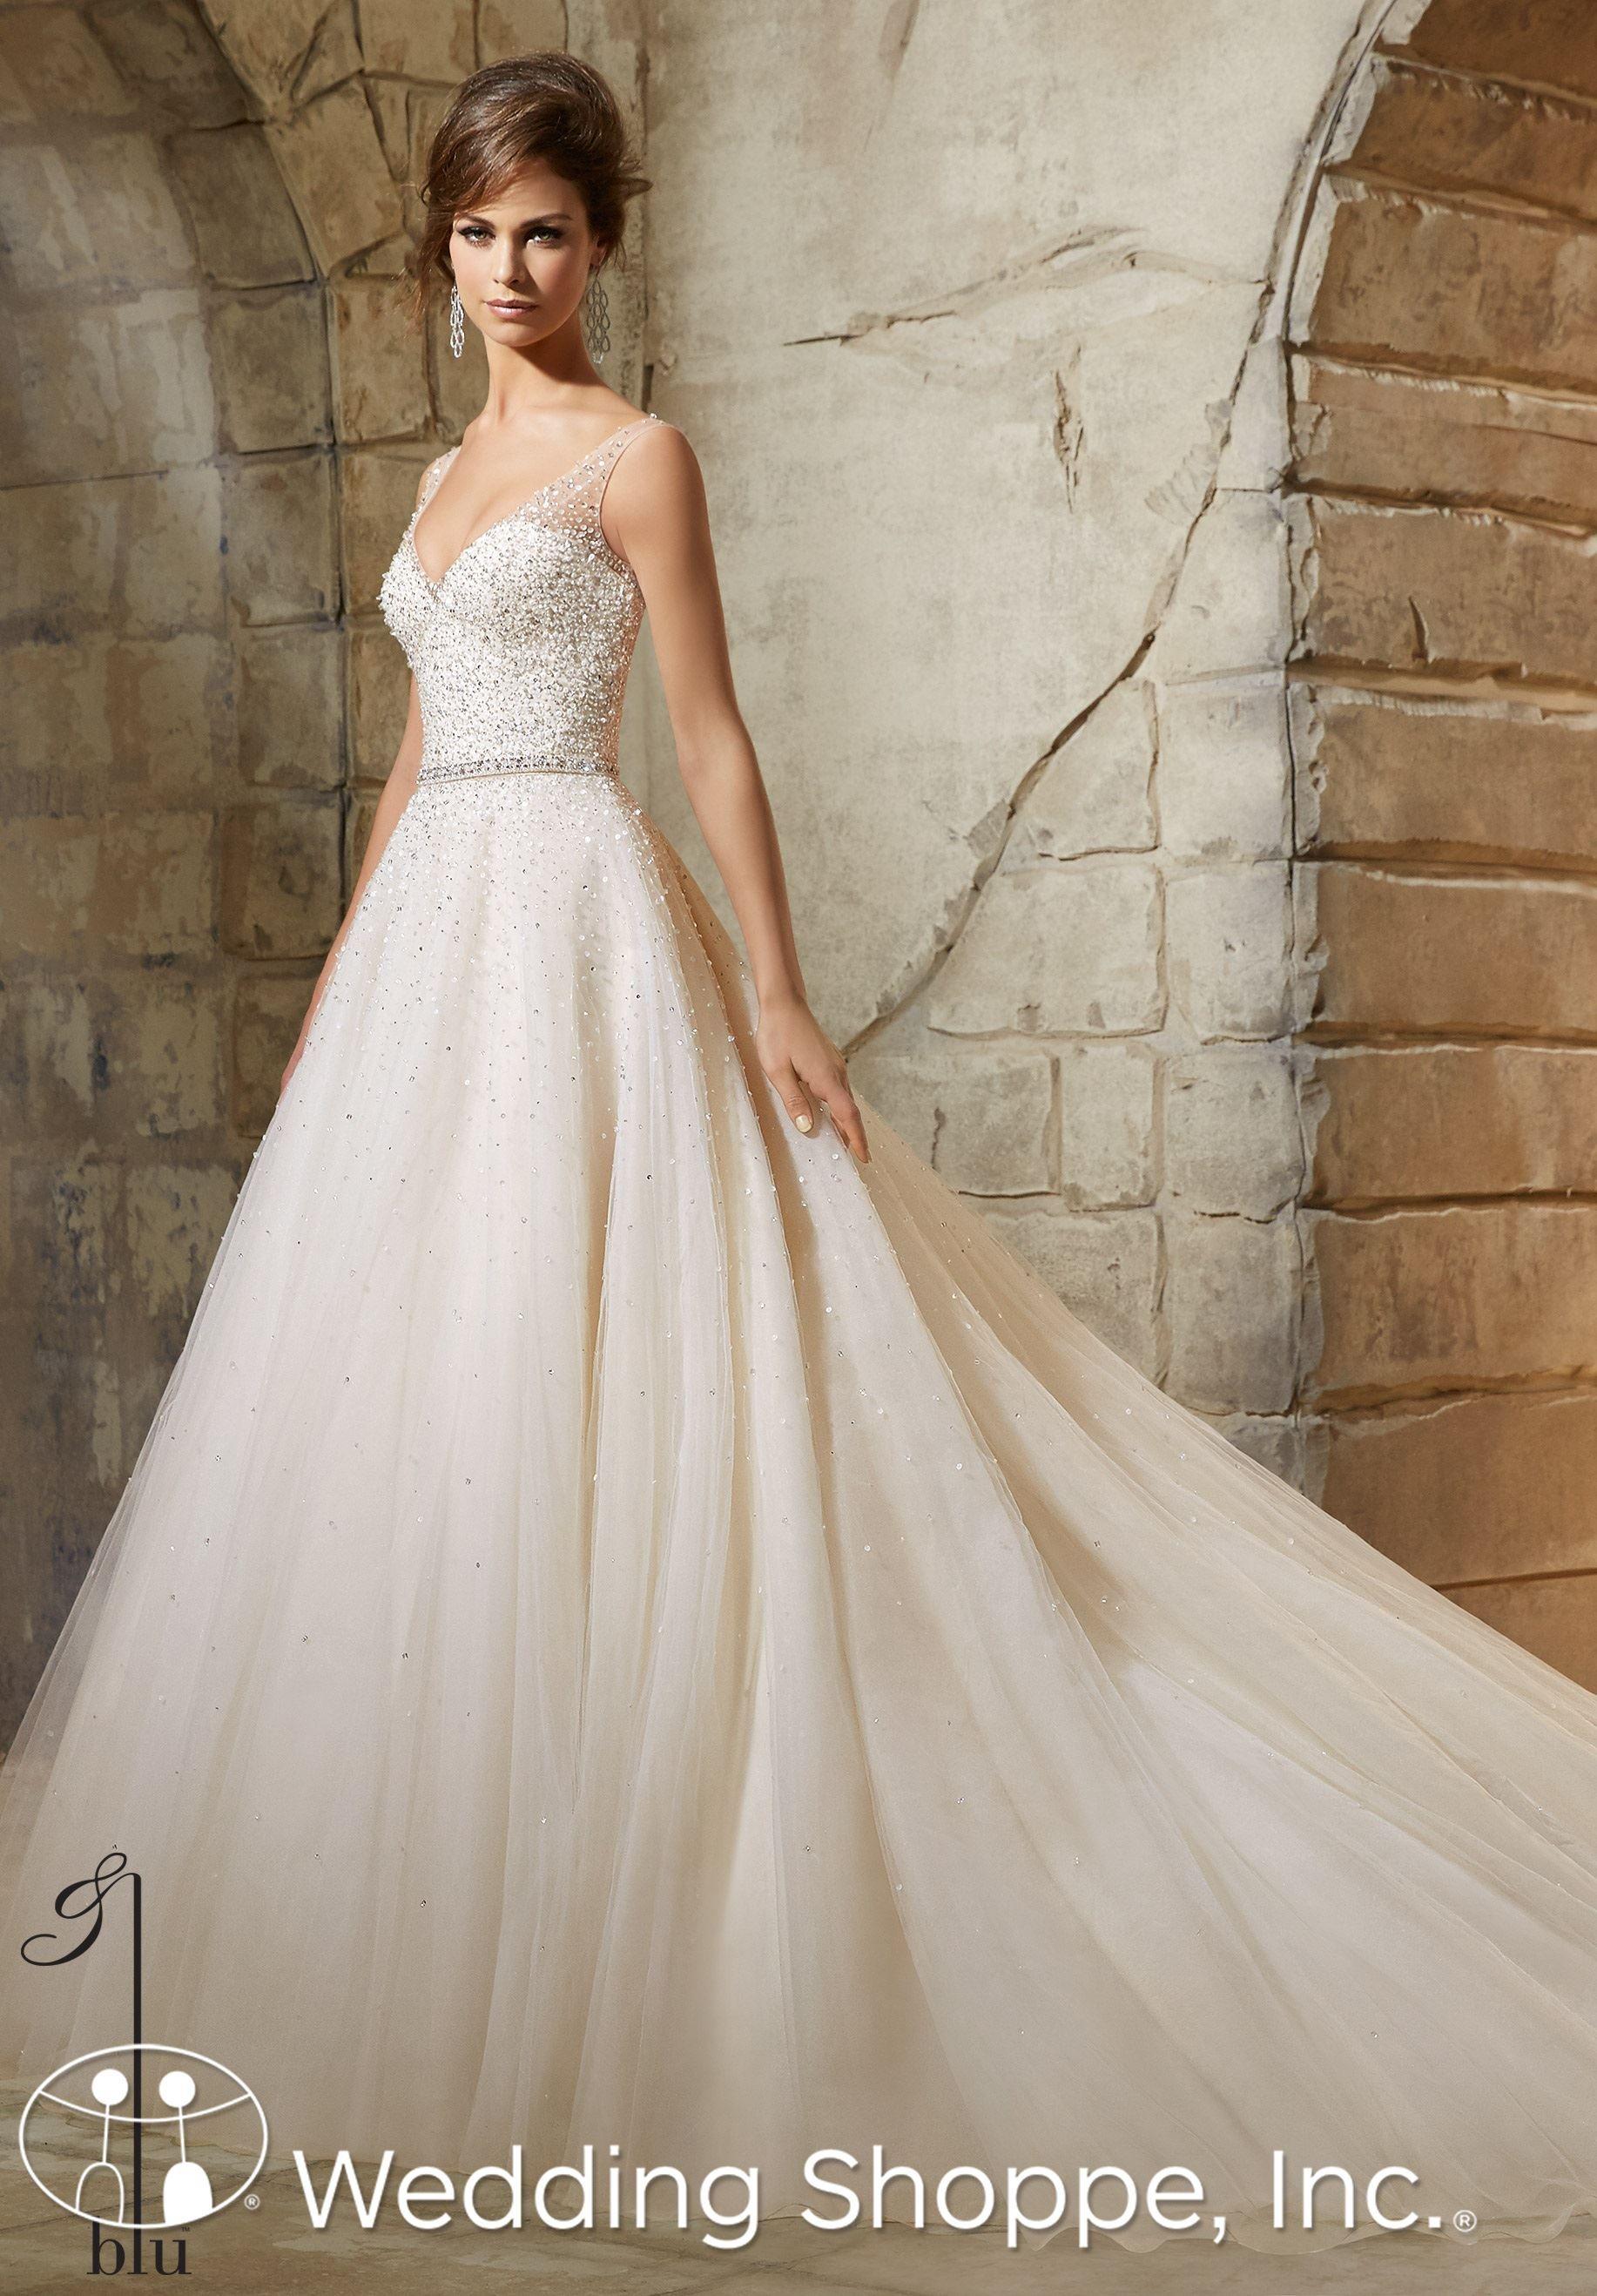 Wedding gowns by blu featuring asymmetrically draped bodice on a